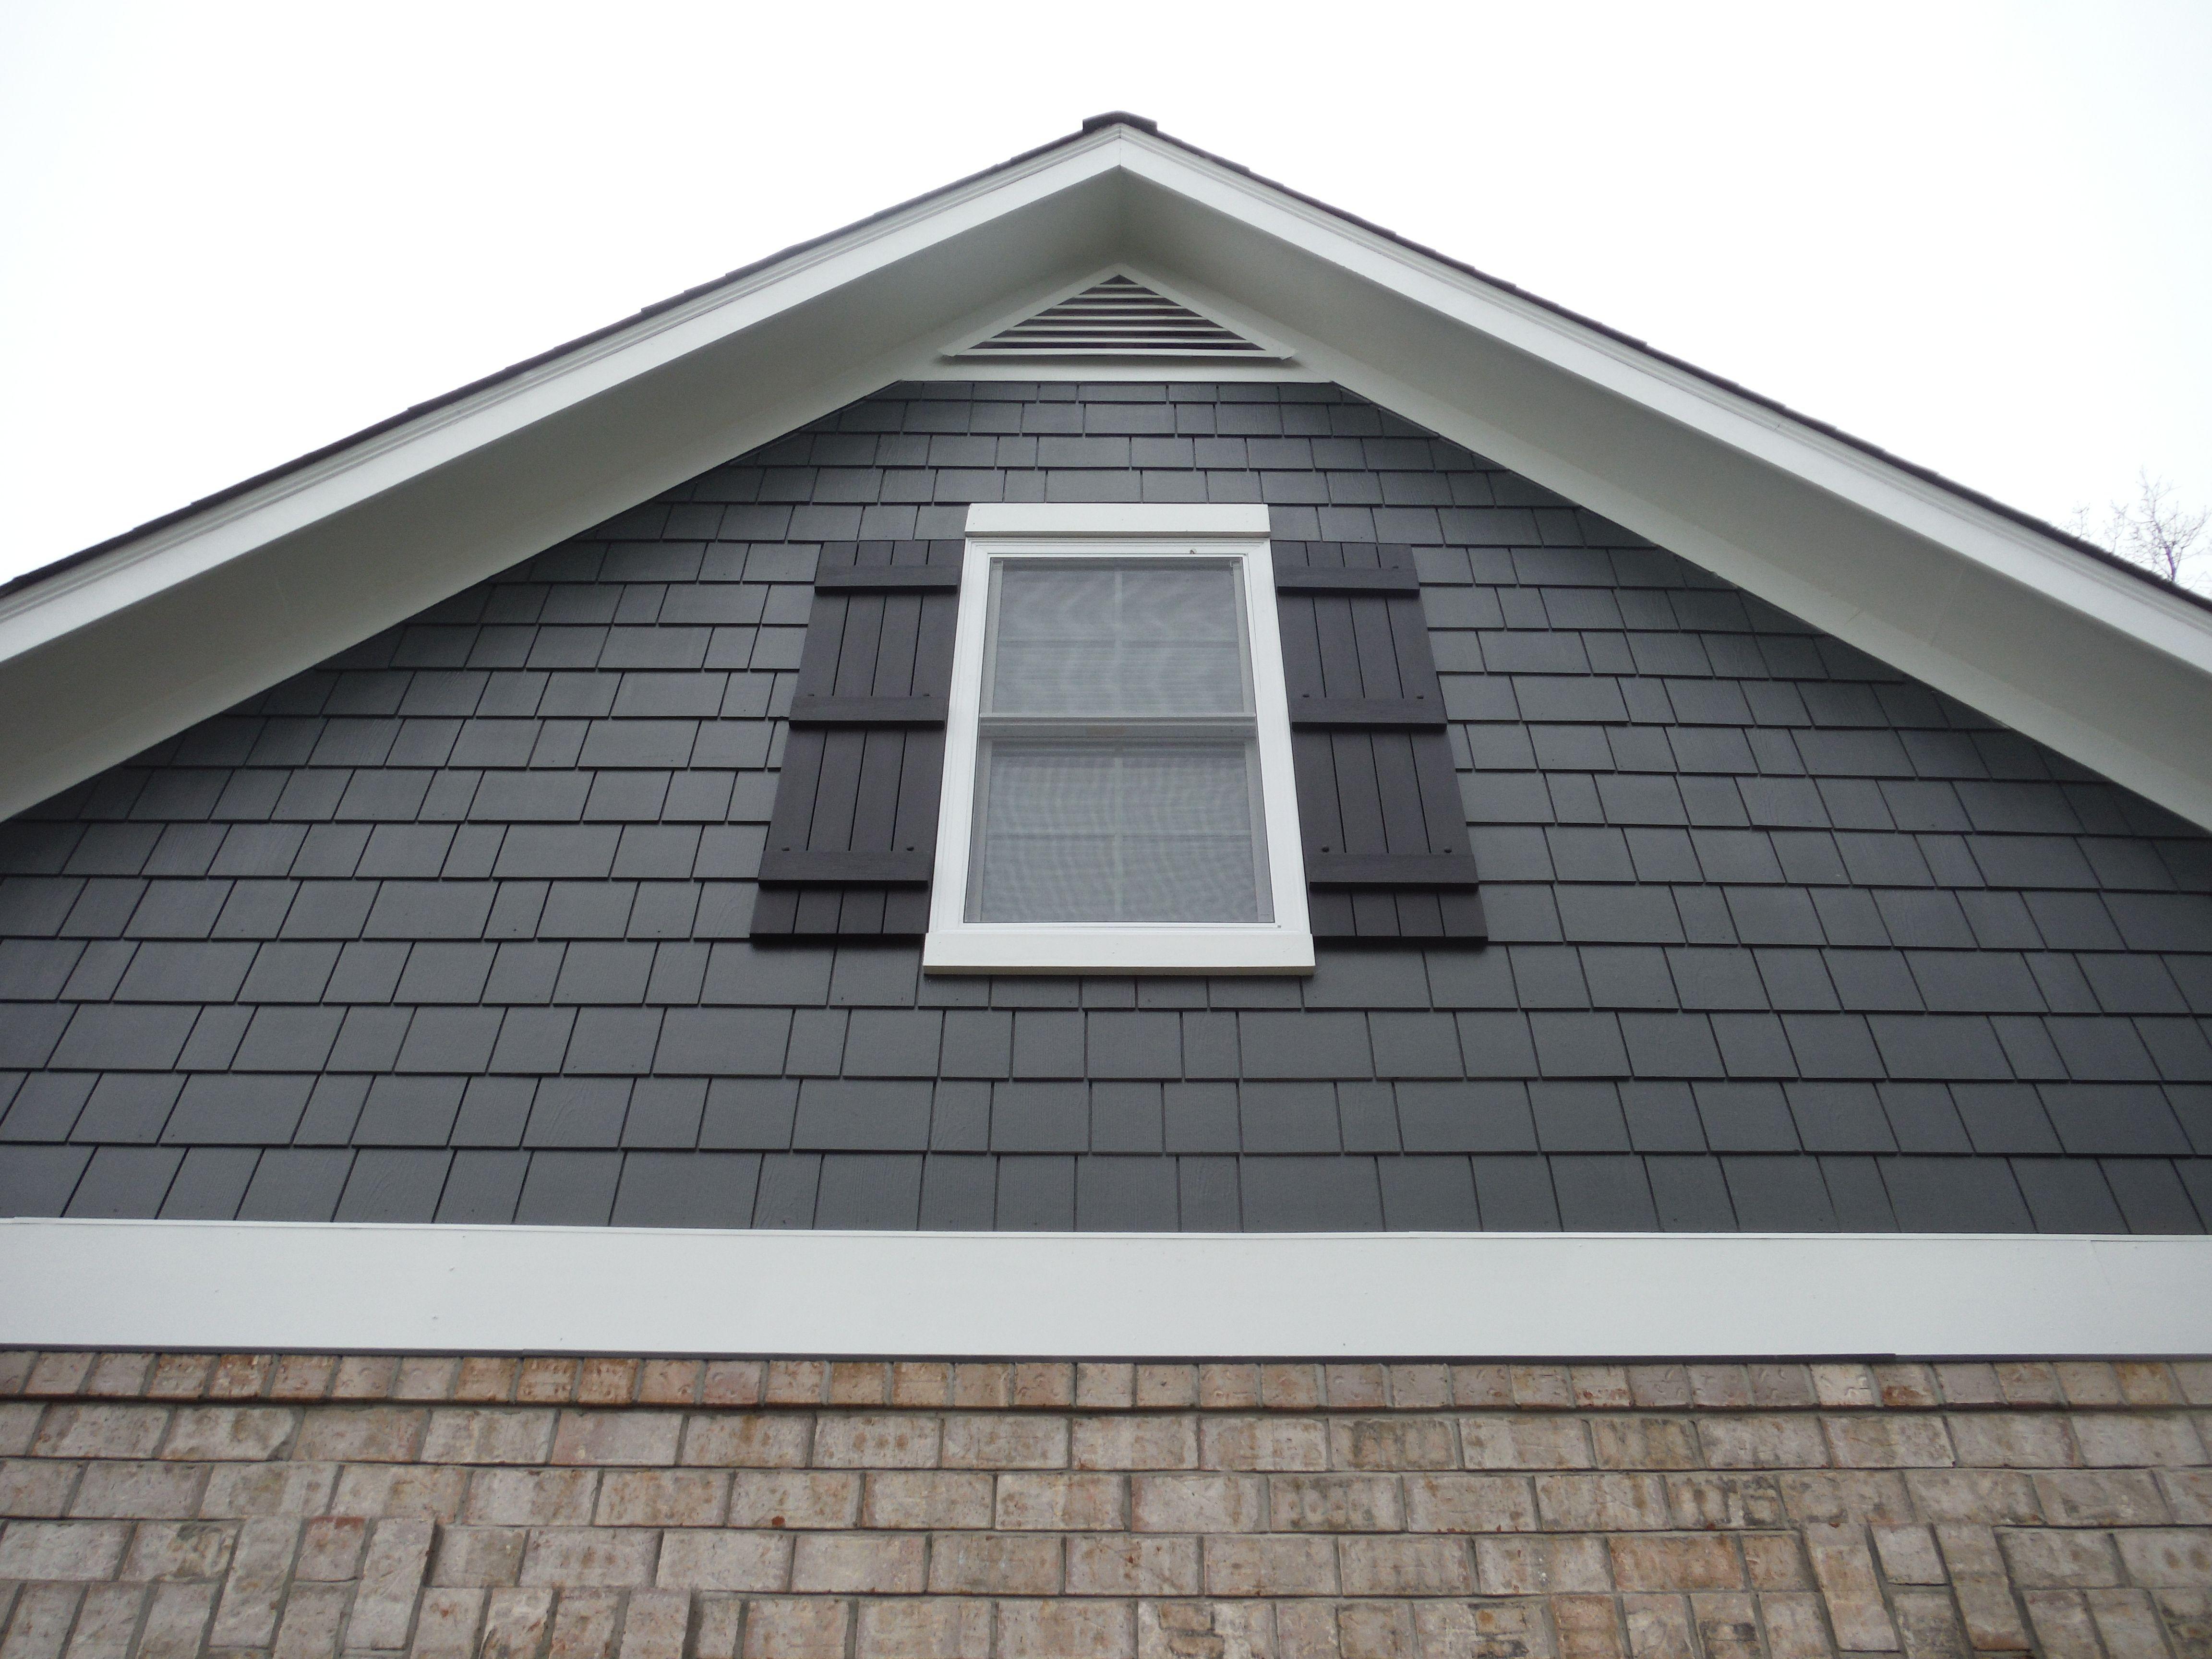 Siding Express Hardie Siding Gray House Exterior Hardie